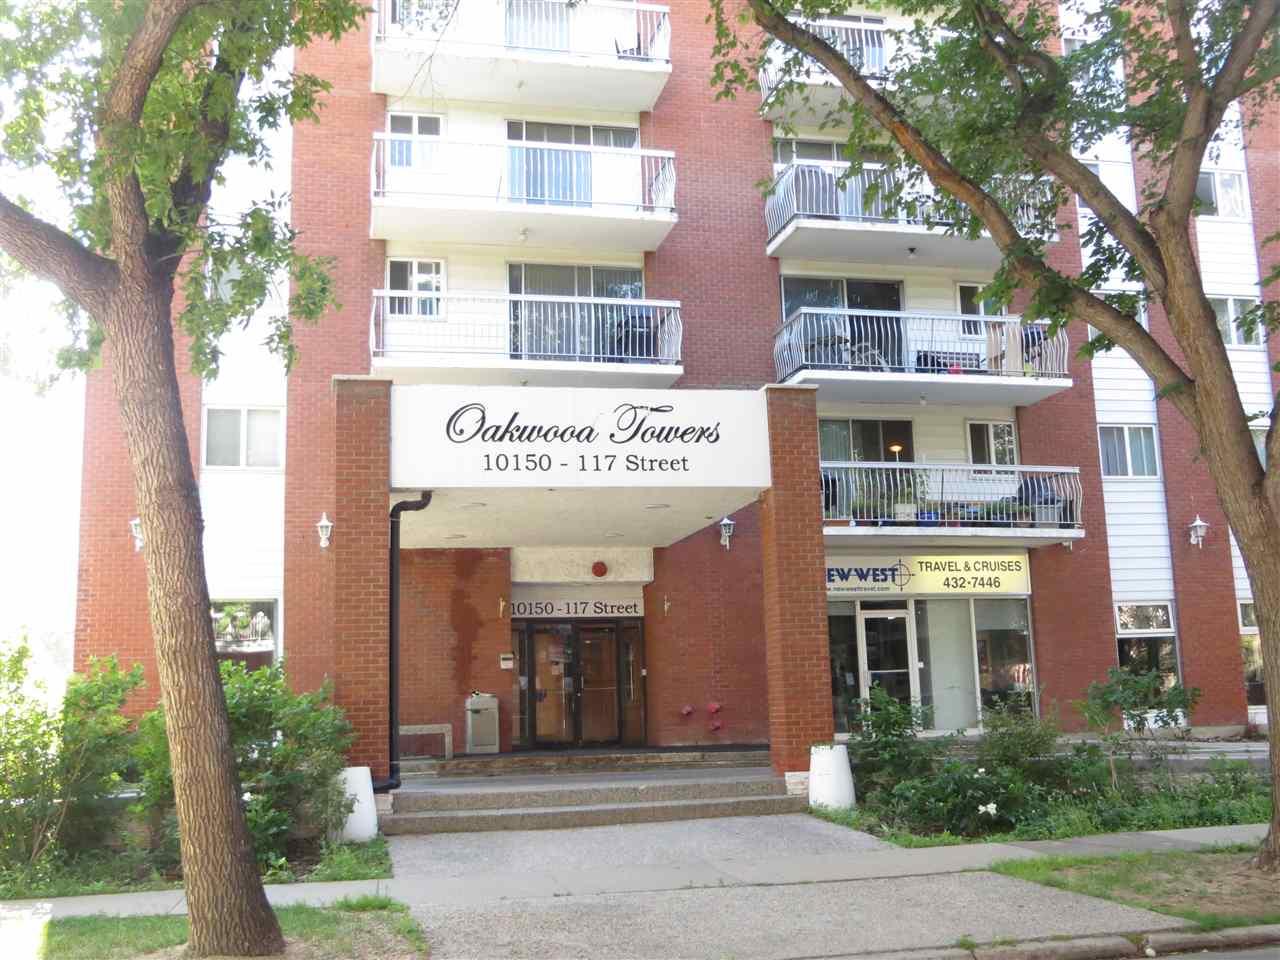 402 10150 117 Street, 1 bed, 1 bath, at $129,900